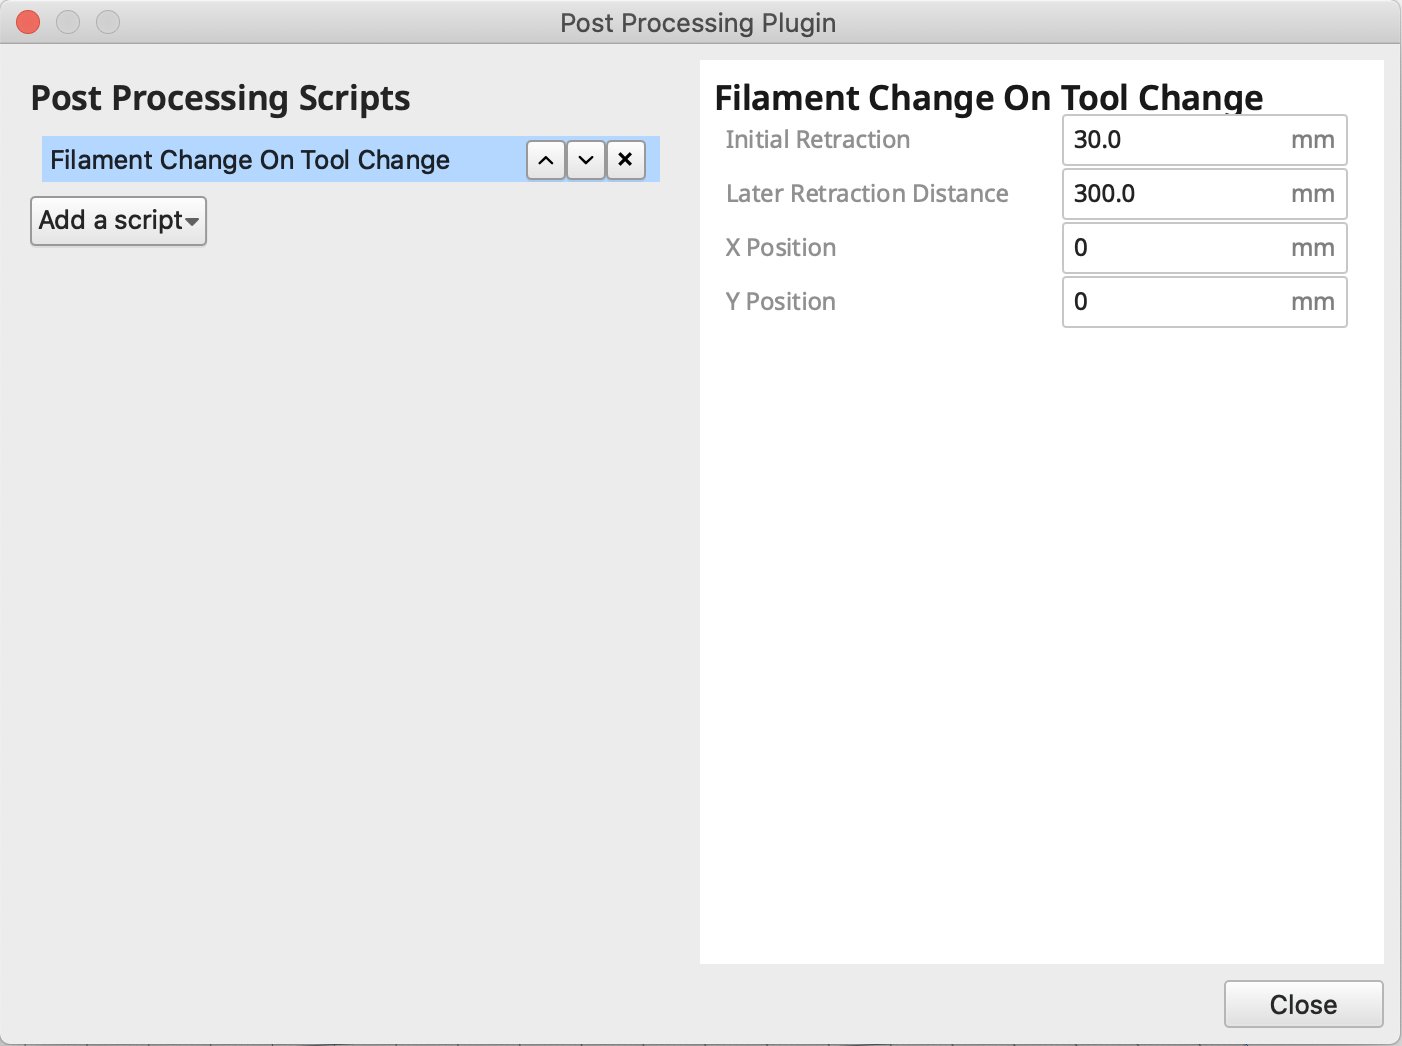 Filament Change on Tool Change